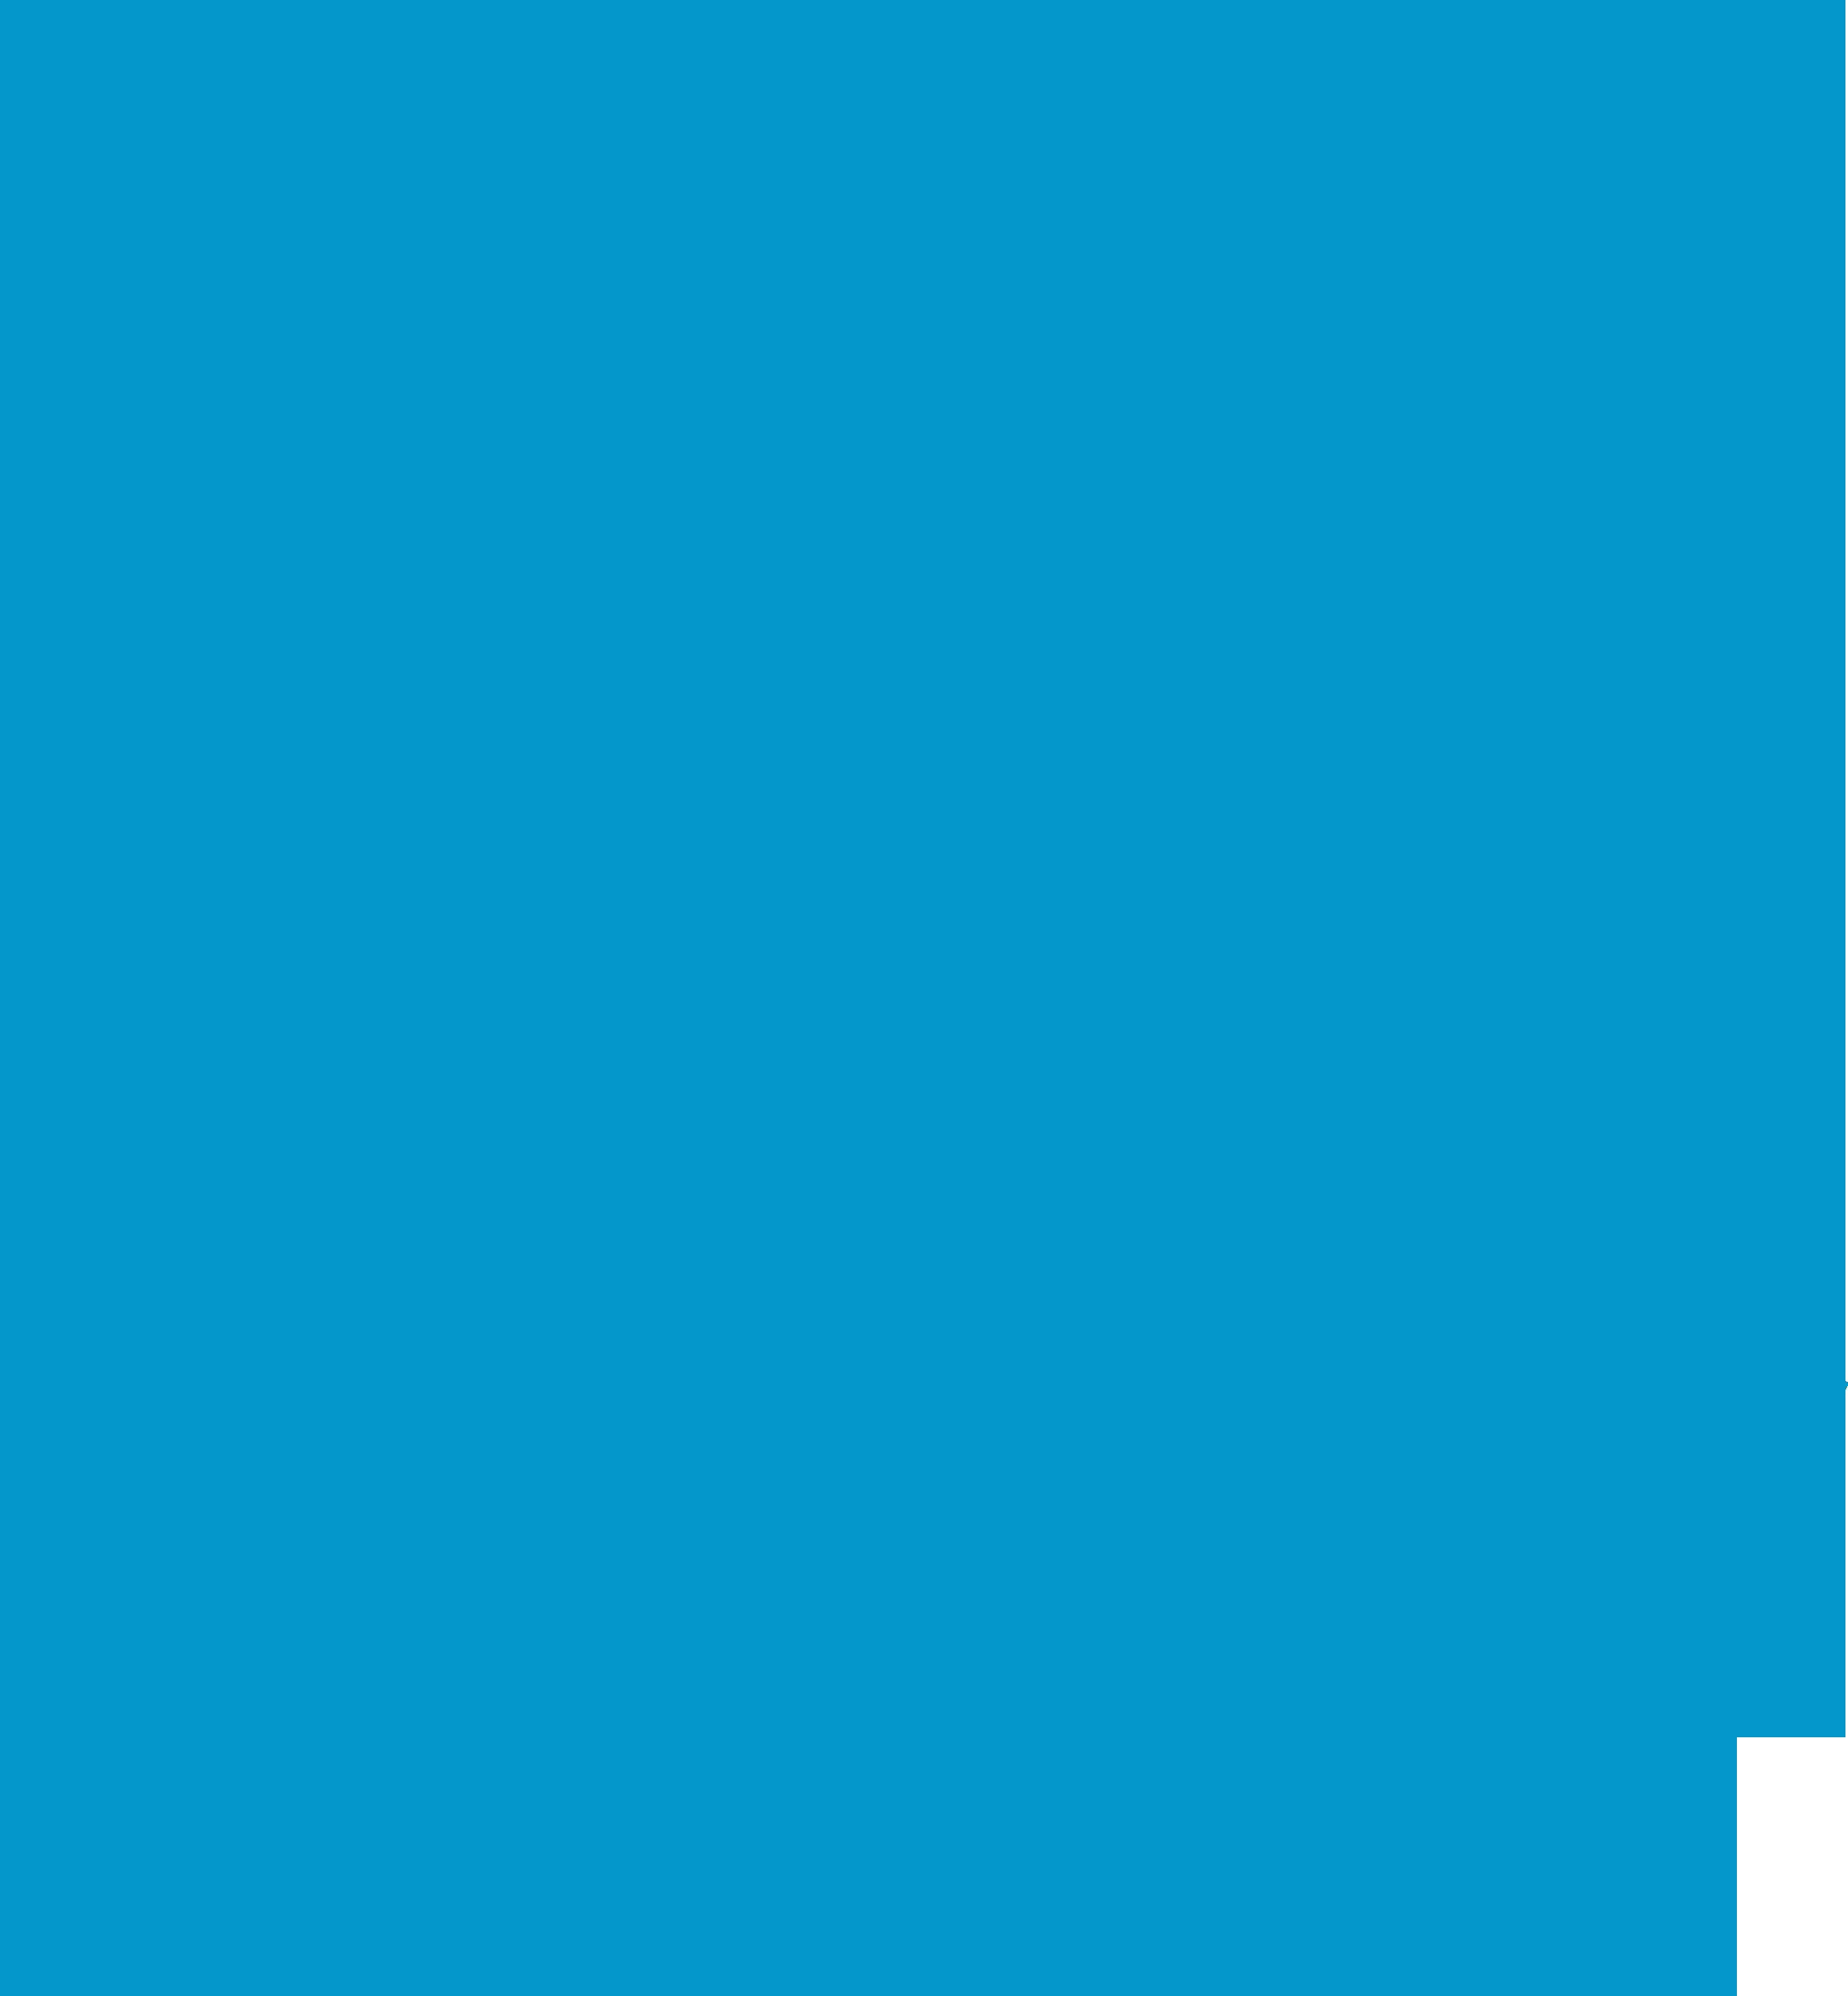 Children's Smile Center | All Rights Reserved 2021